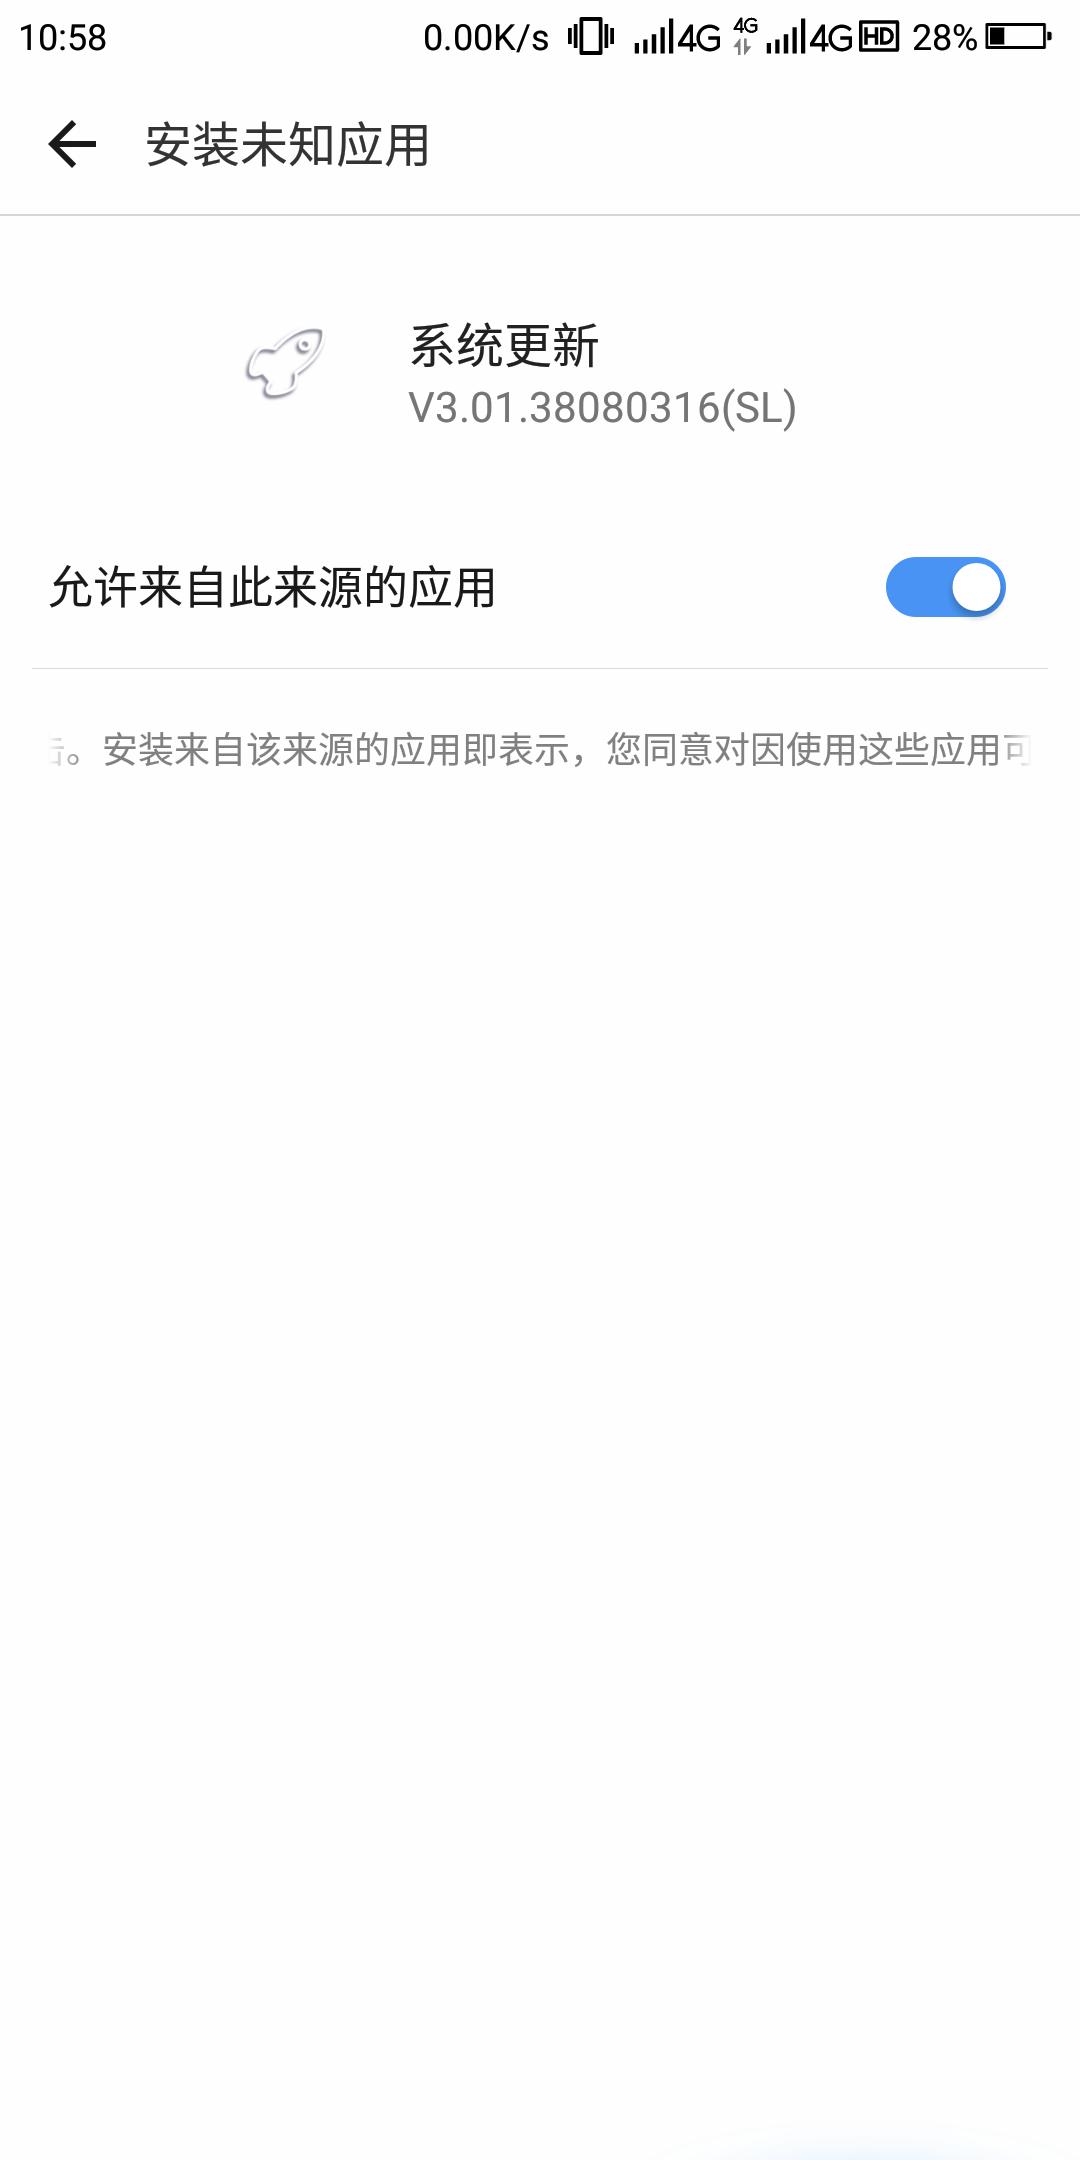 Screenshot_2019-03-24-10-58-24.png